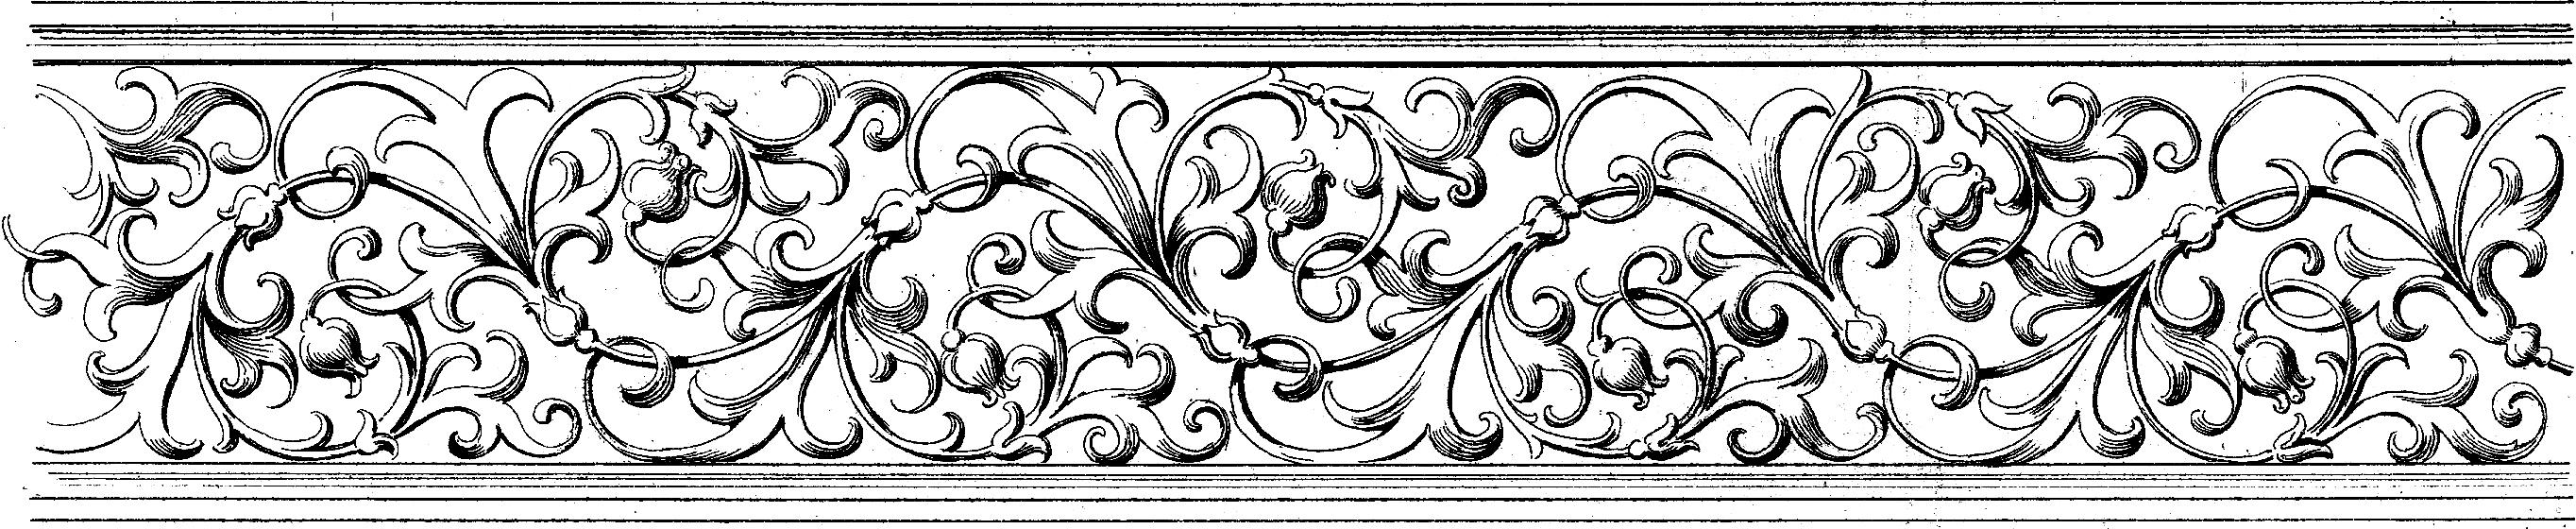 Baroque Ornamental Border Image